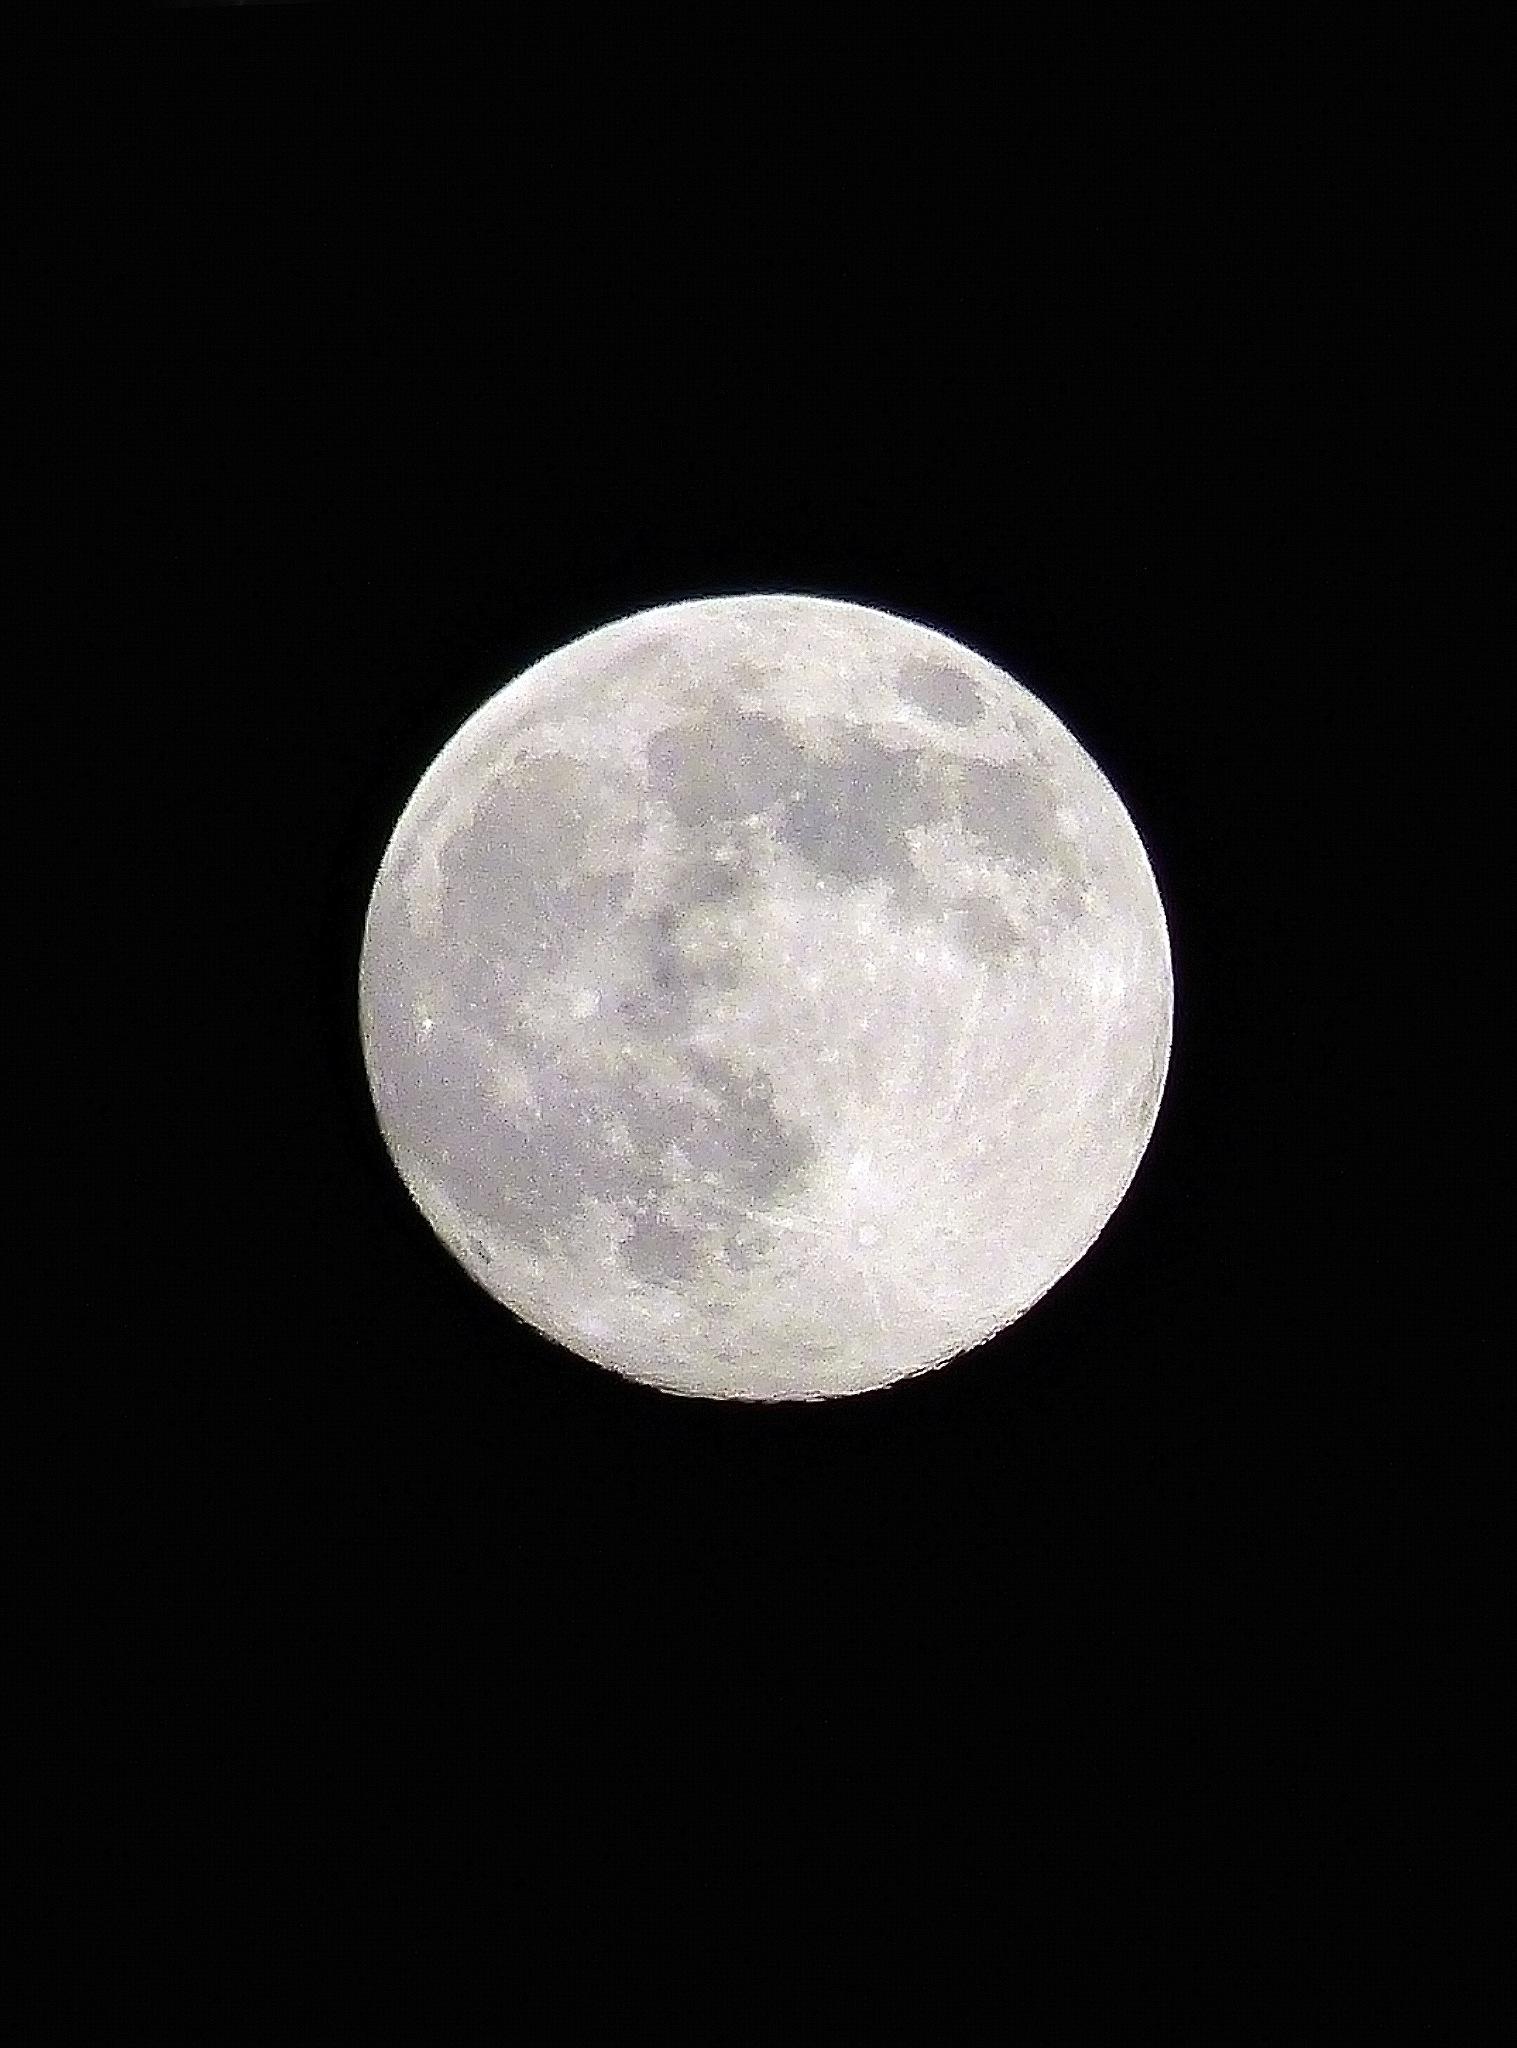 Yesterday's Full Moon by Lilla Ondok